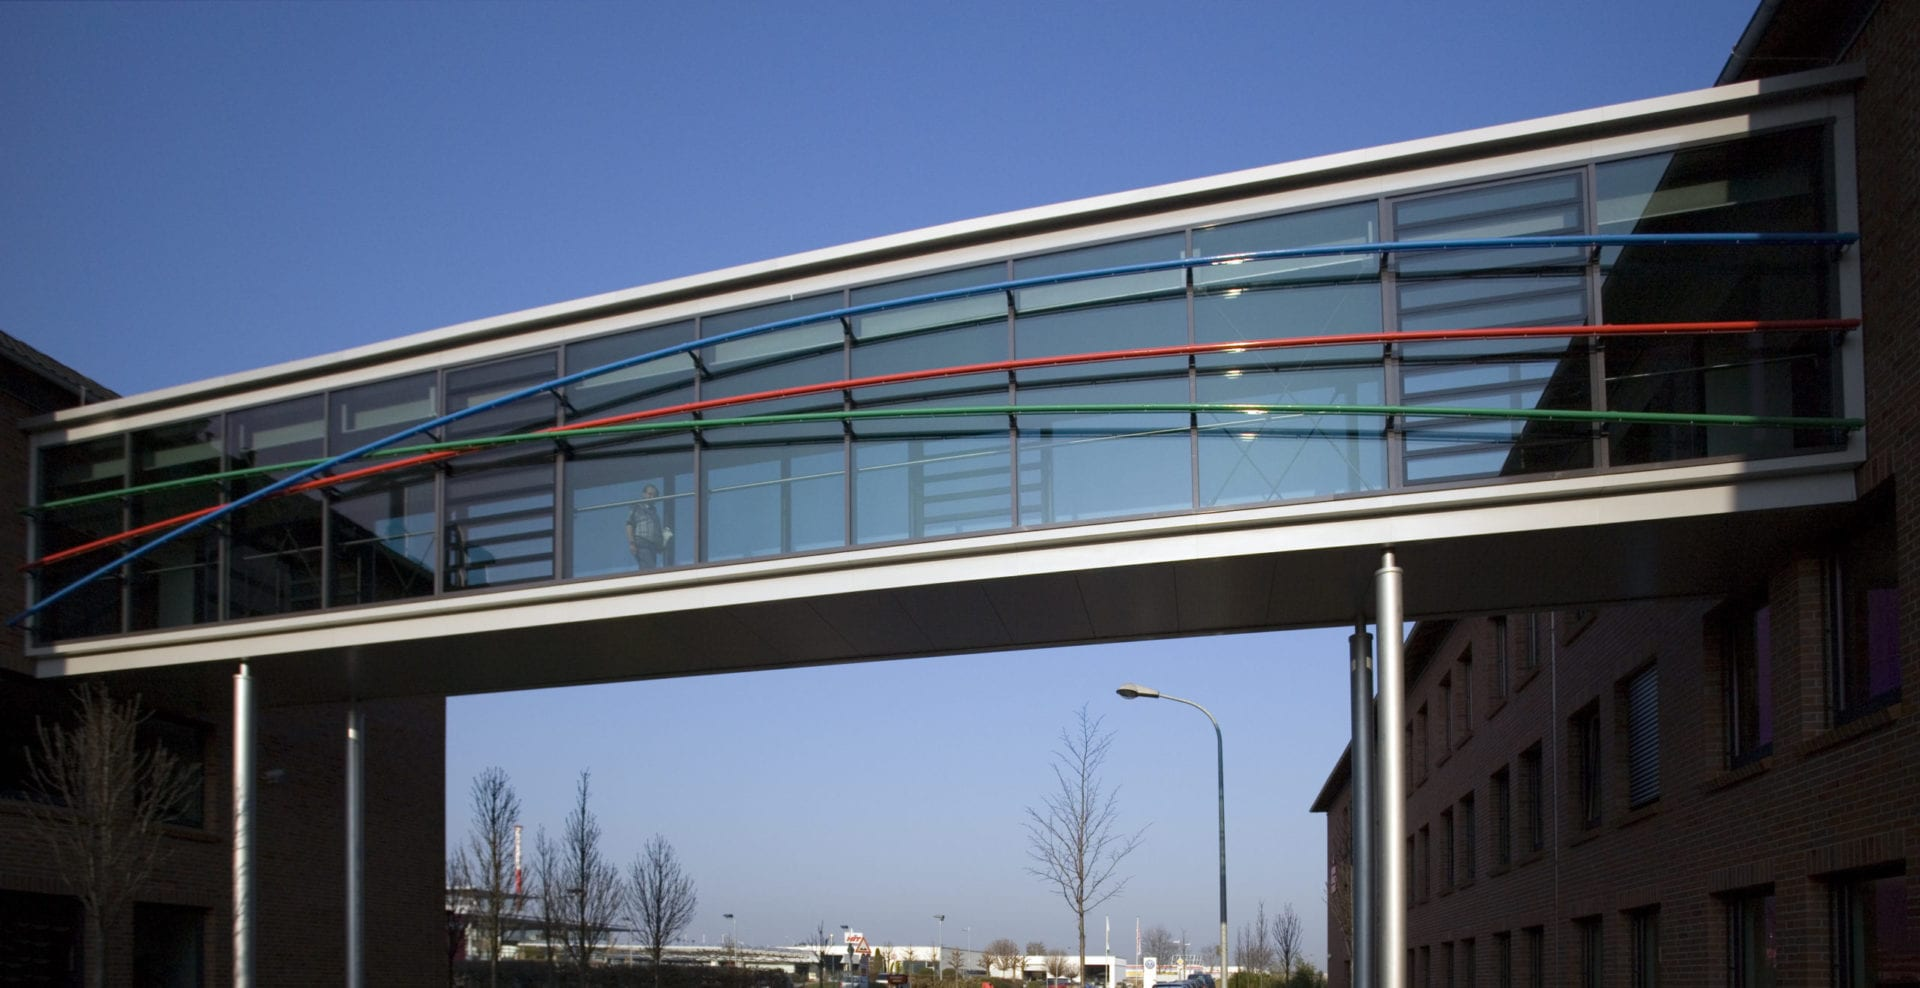 Verbindungsbrücke Kreissparkasse